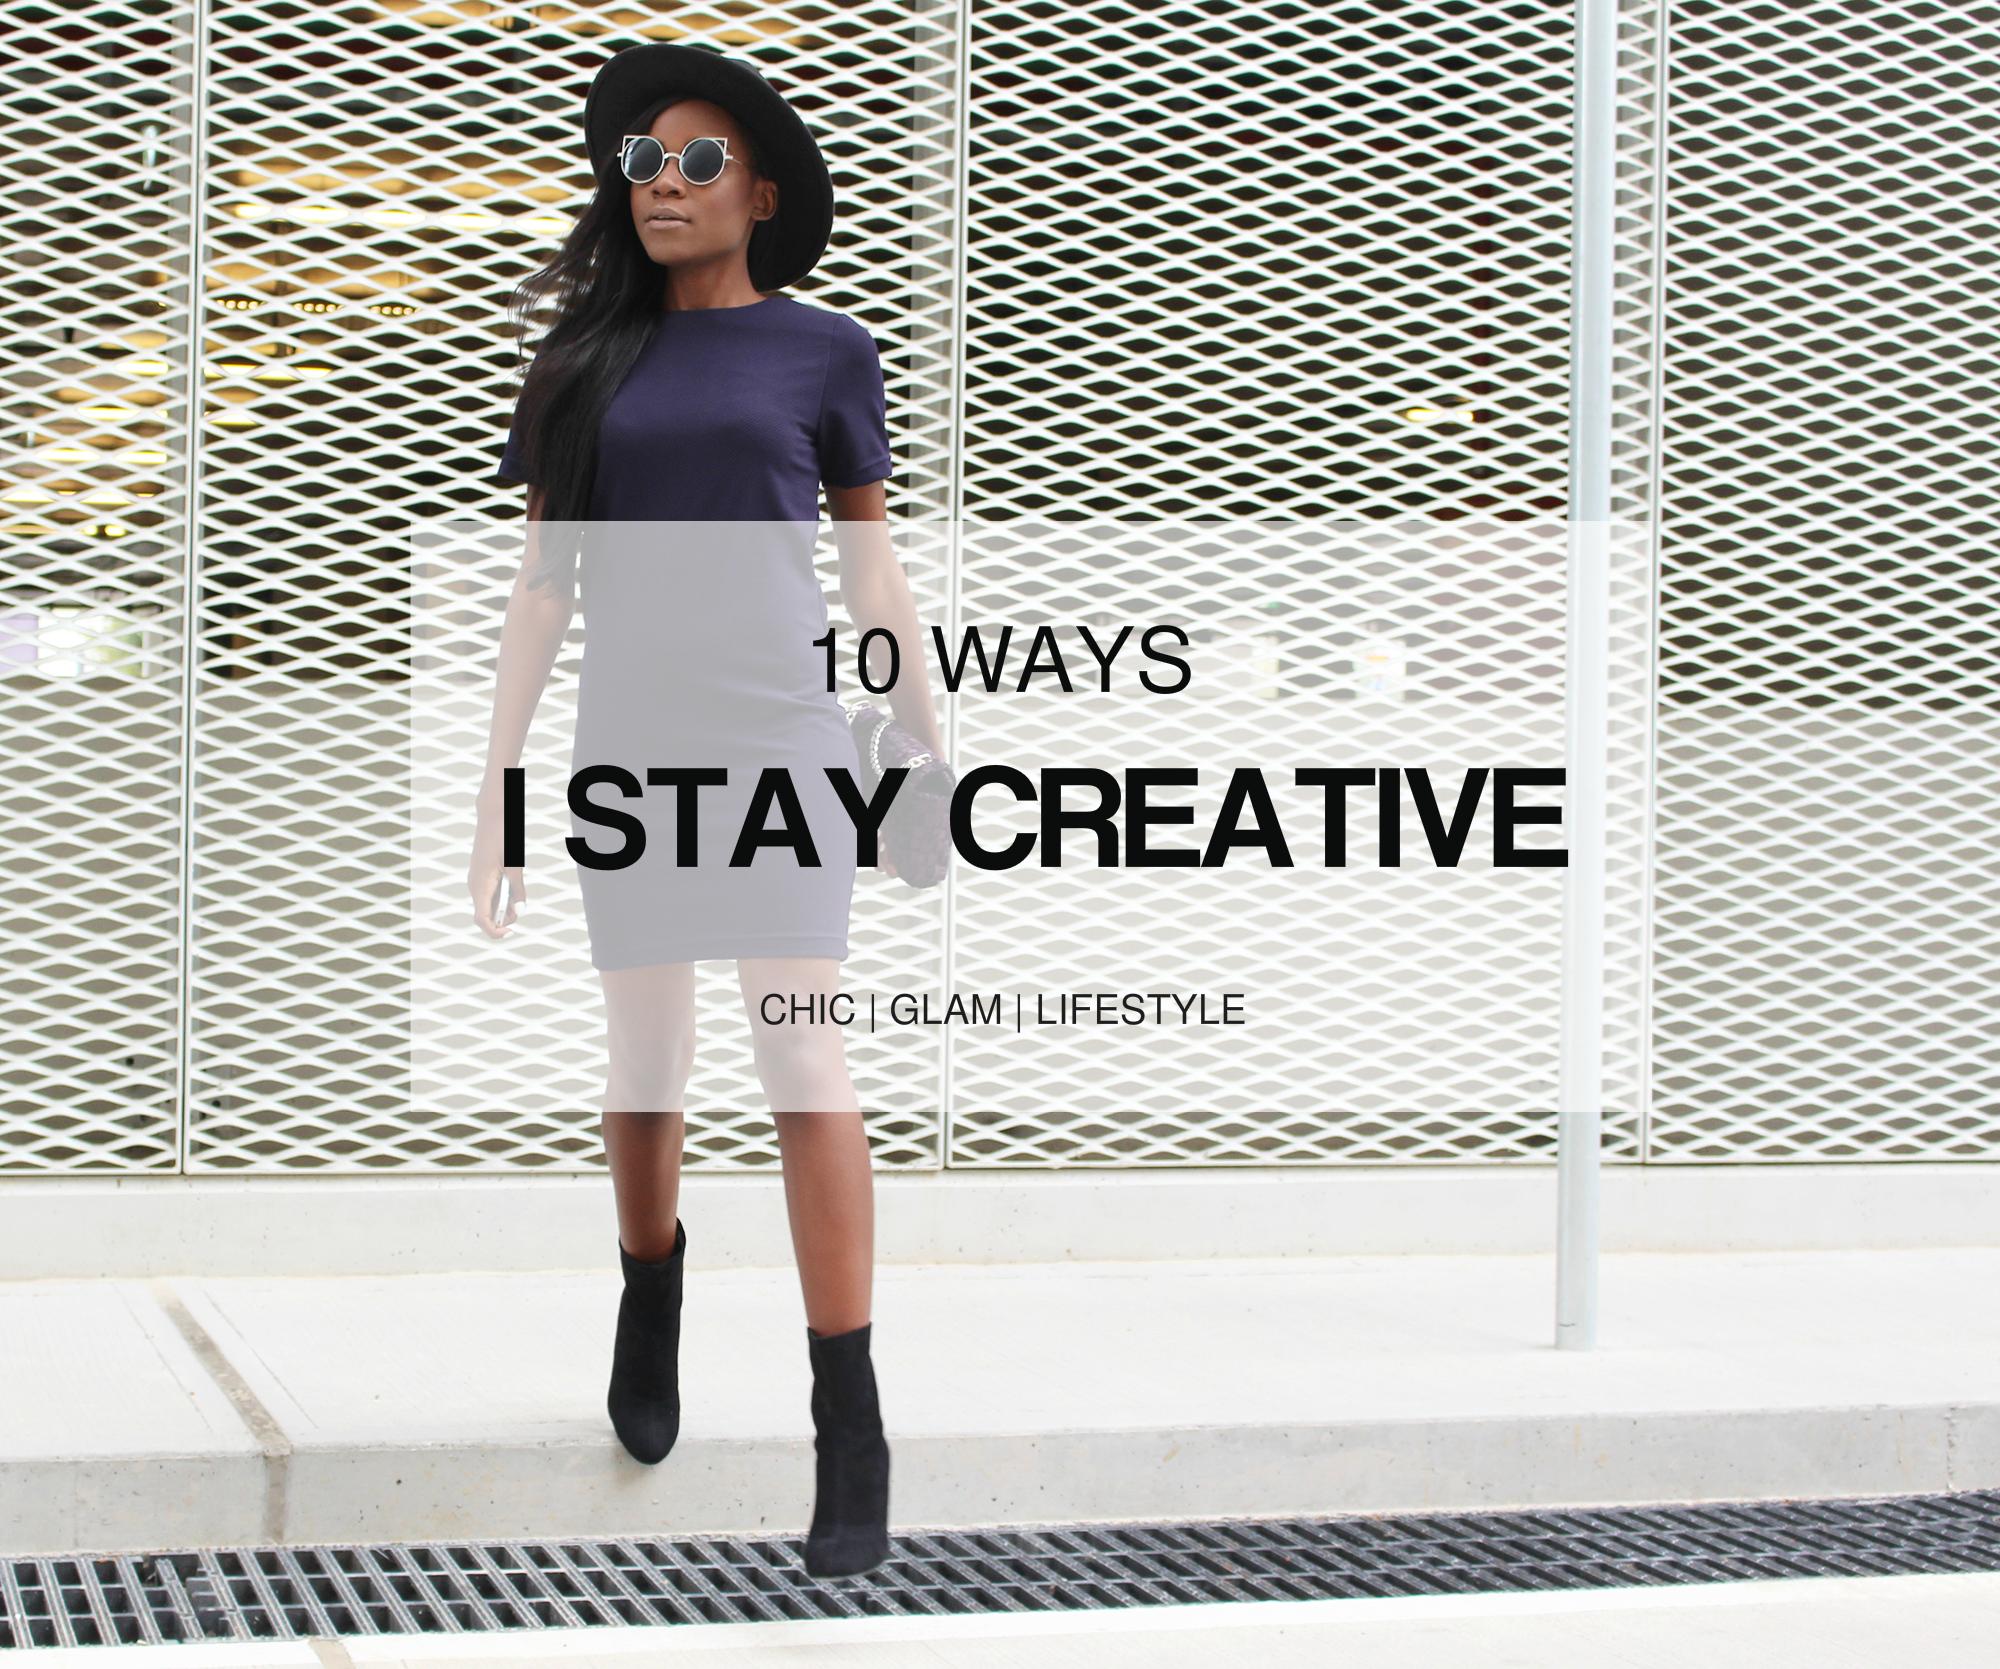 10-ways-to-stay-creative